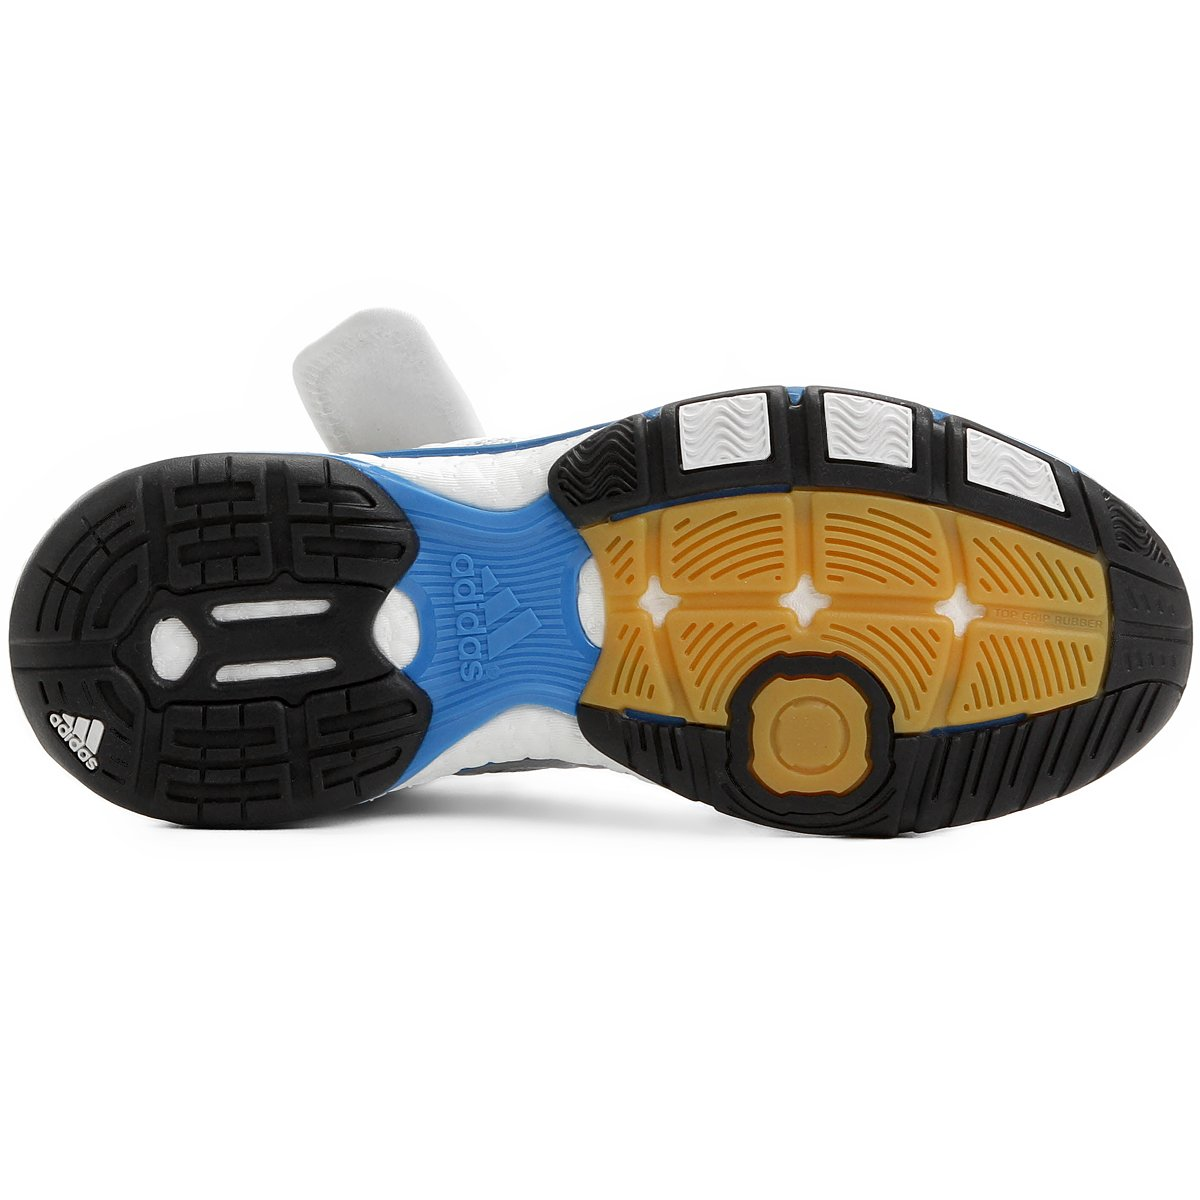 Tênis Adidas Energy Volley Boost Mid - Compre Agora  9e1db9da9ccb5